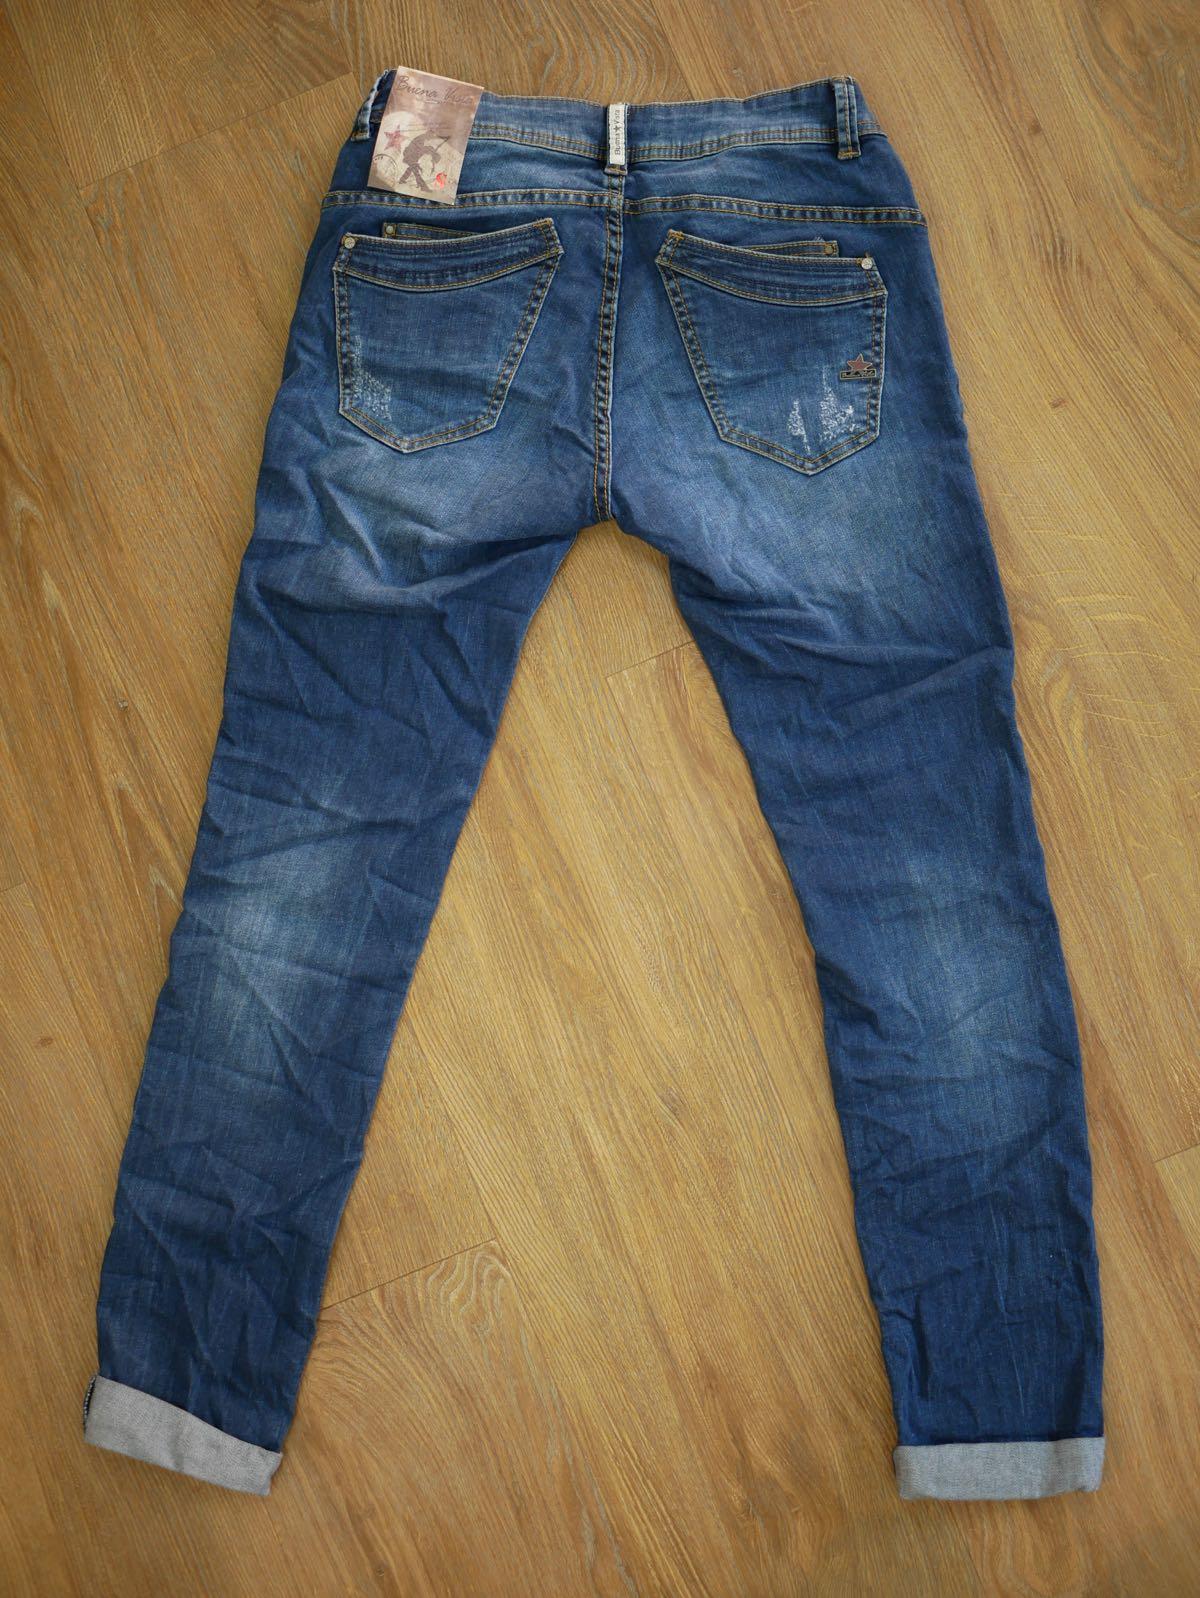 0445d9ef15f7 Buena Vista Jeans Malibu Stretch Denim - Modehaus Rieker Süßen ...